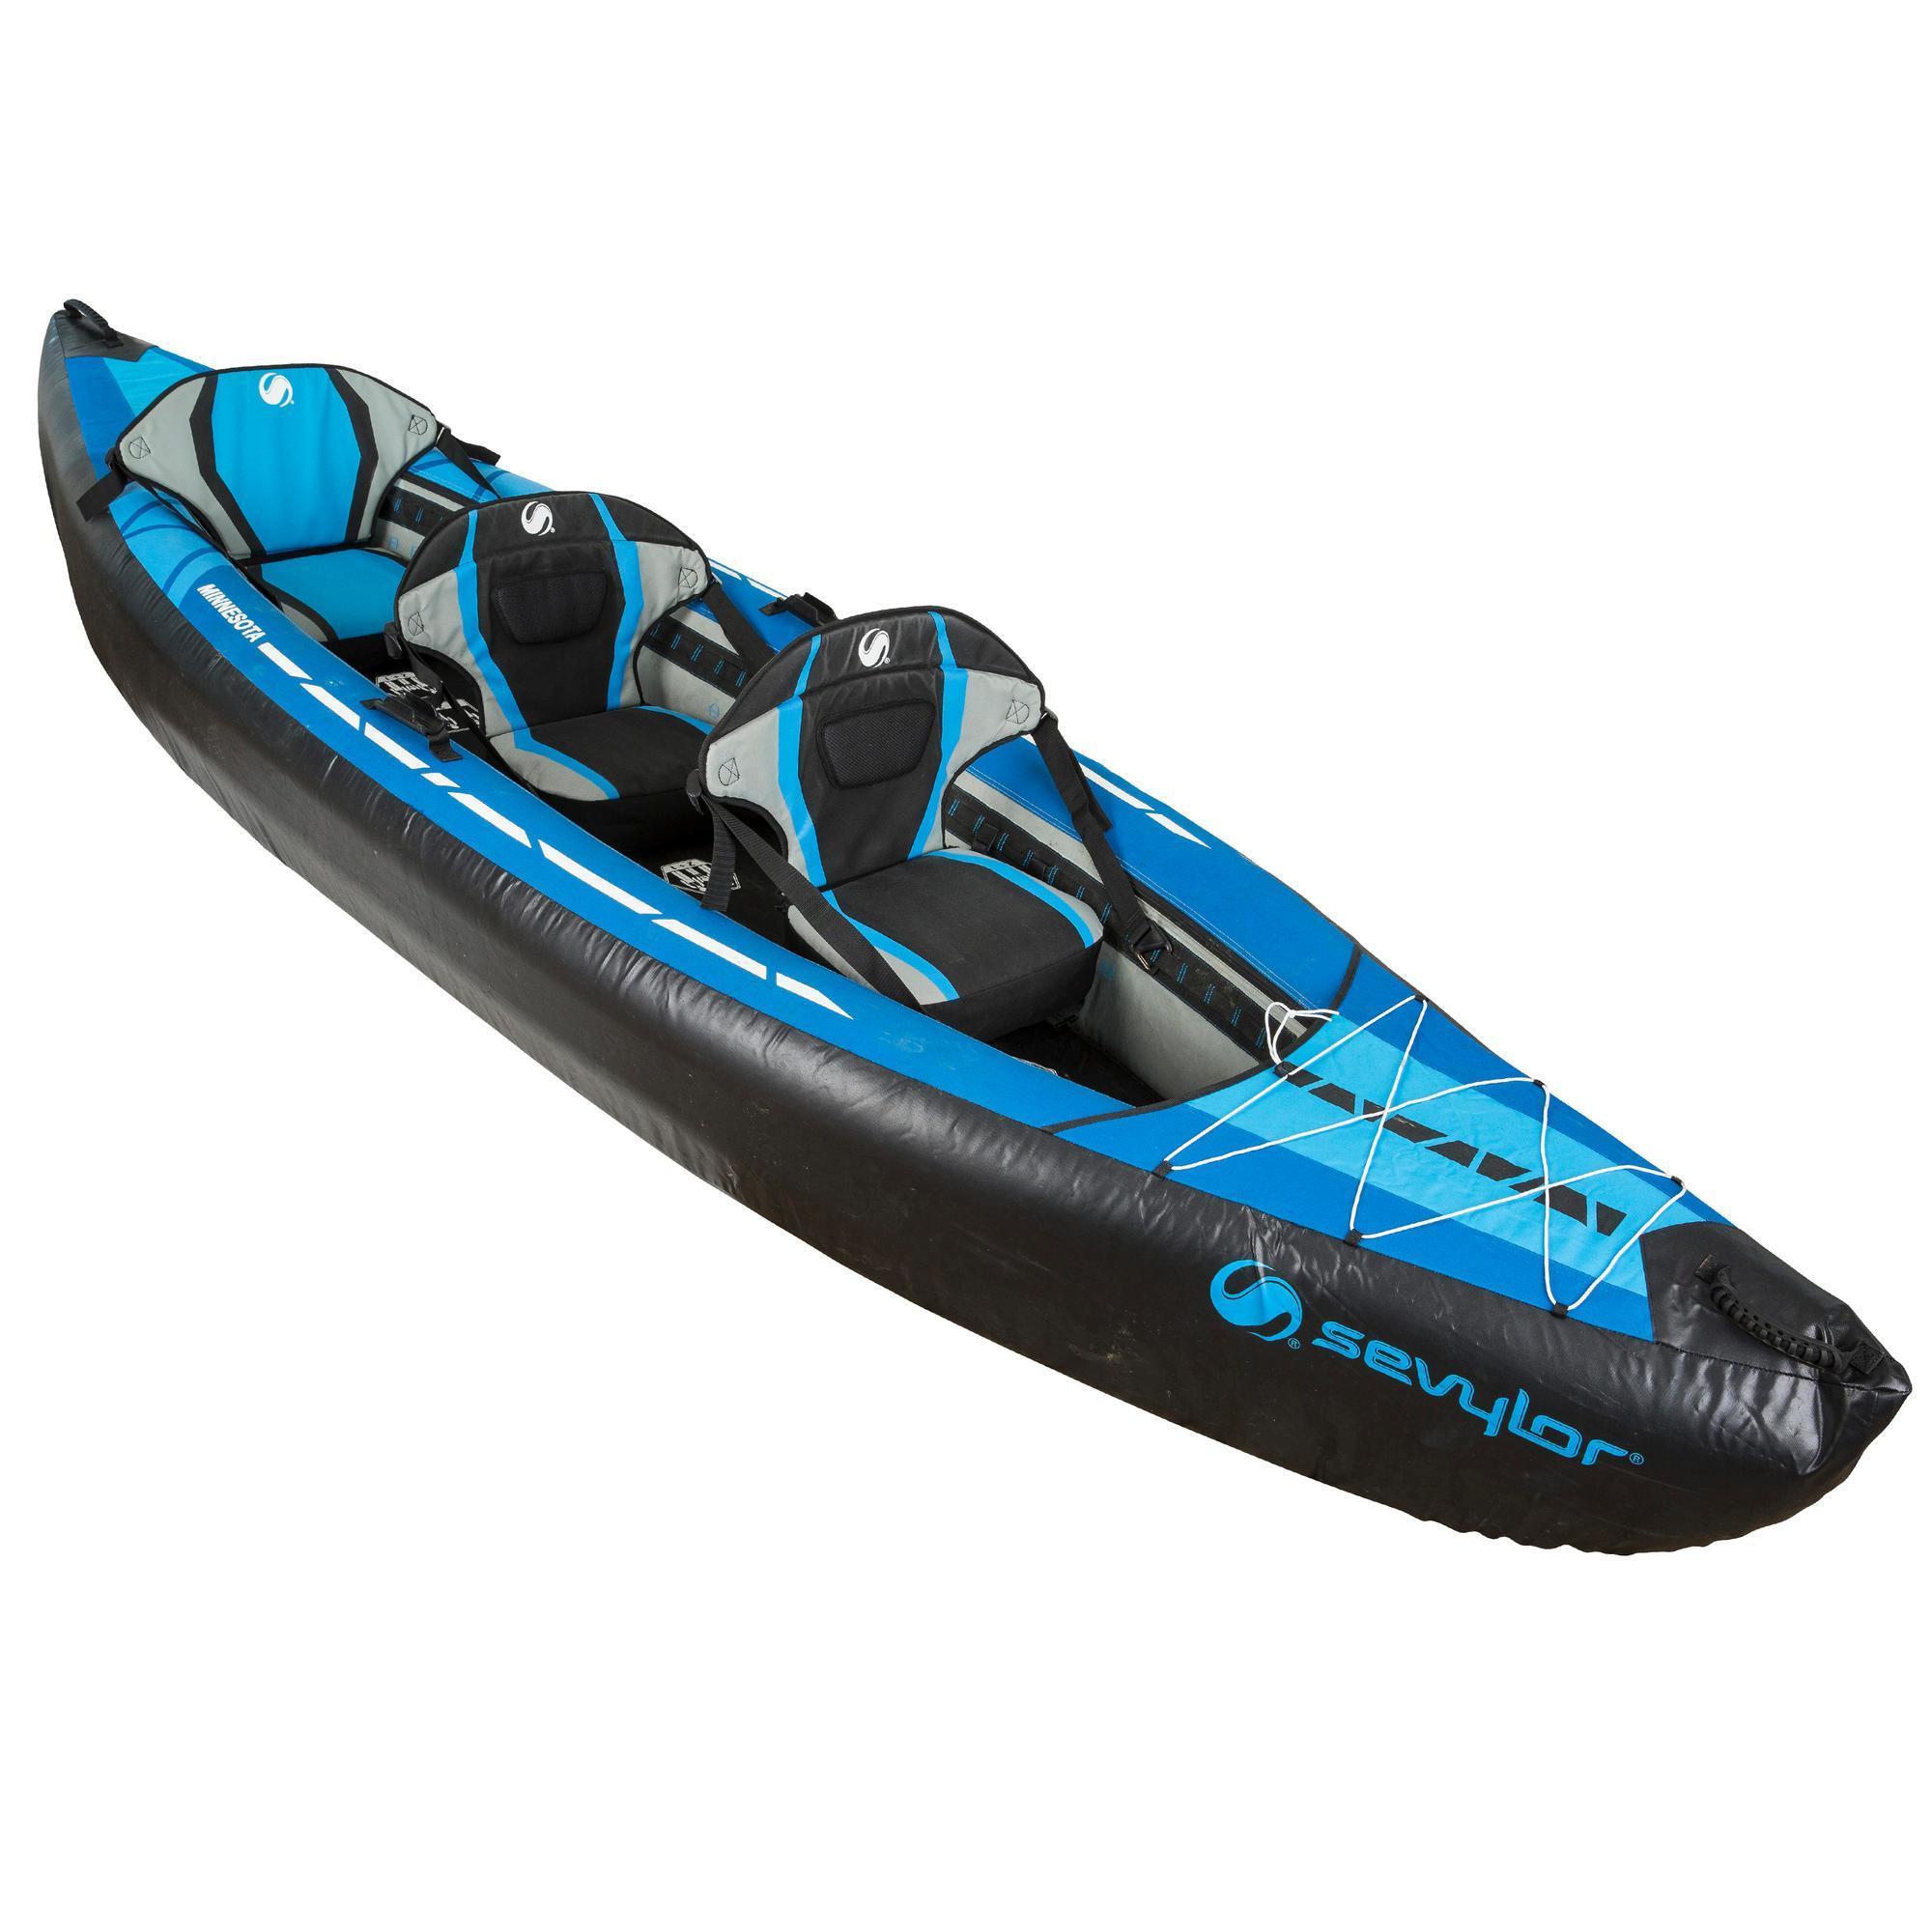 Comprar Kayaks Hinchables y Rígidos Online  6ddd26cb70493